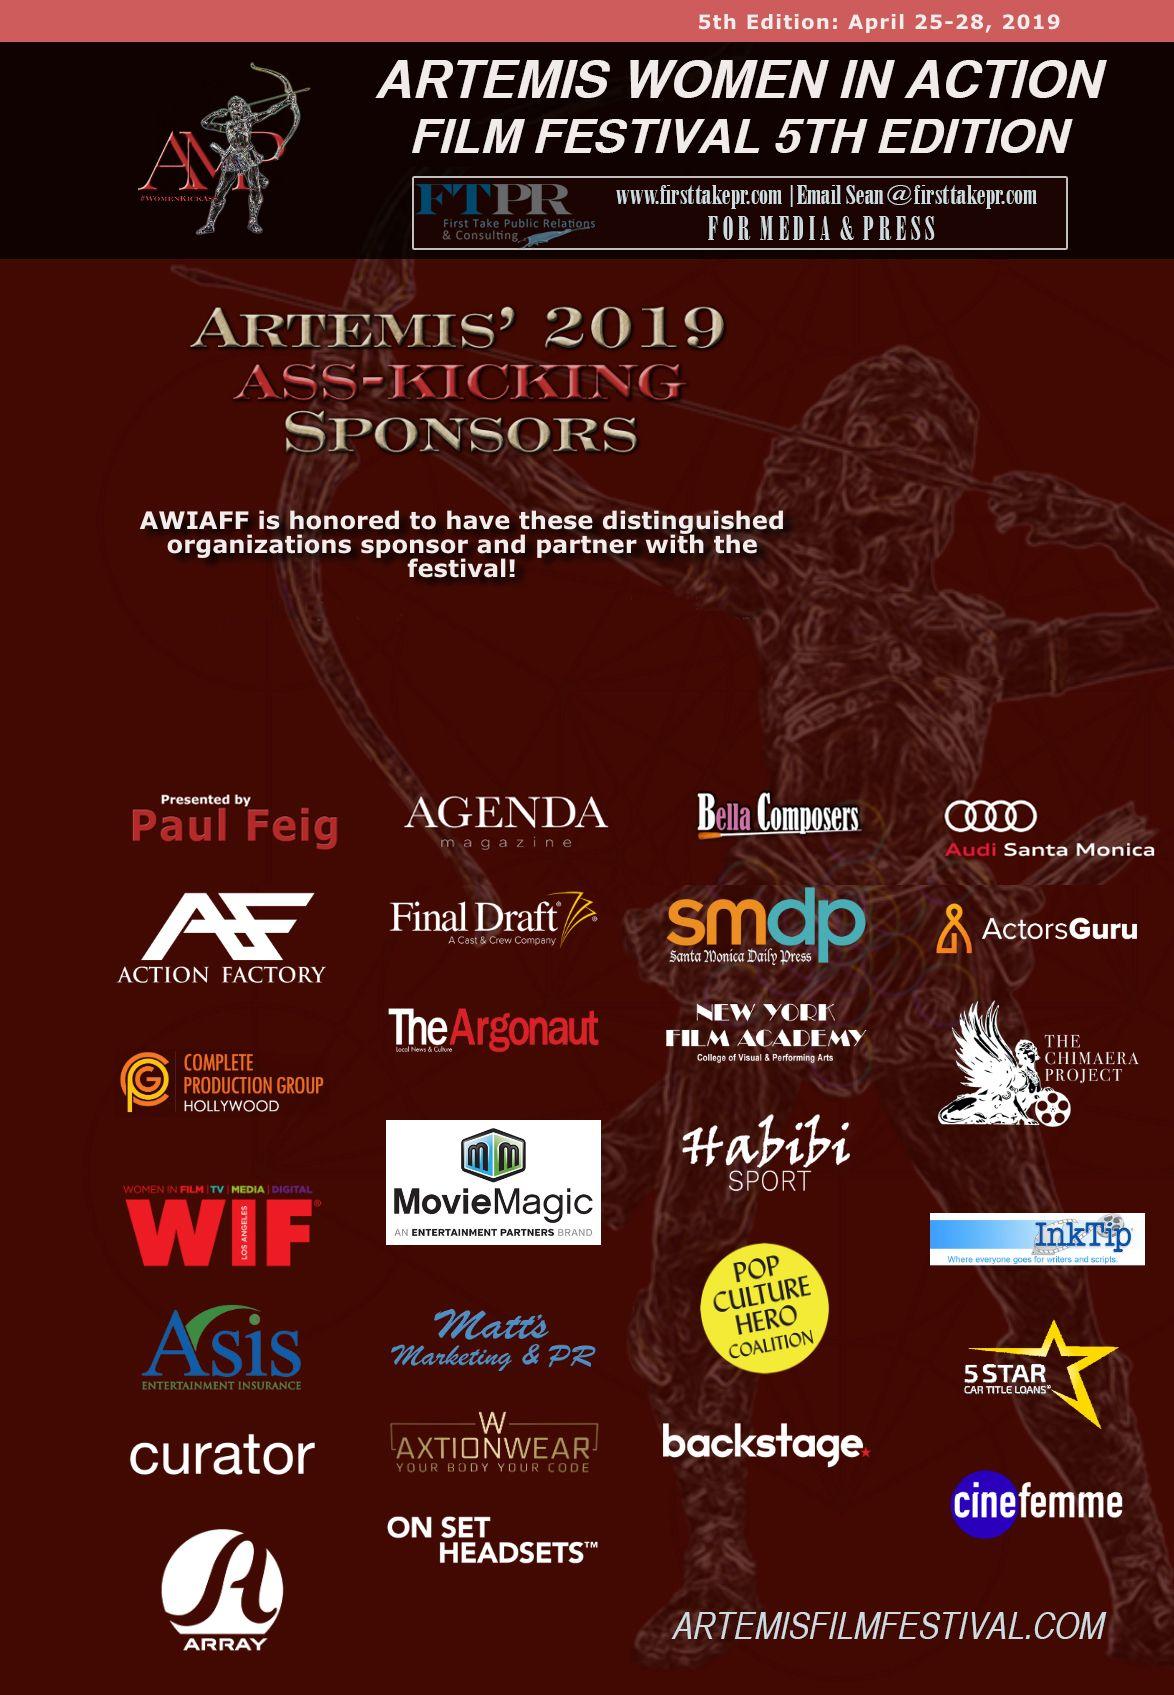 ARTEMIS 2019 SPONSOR PAGE